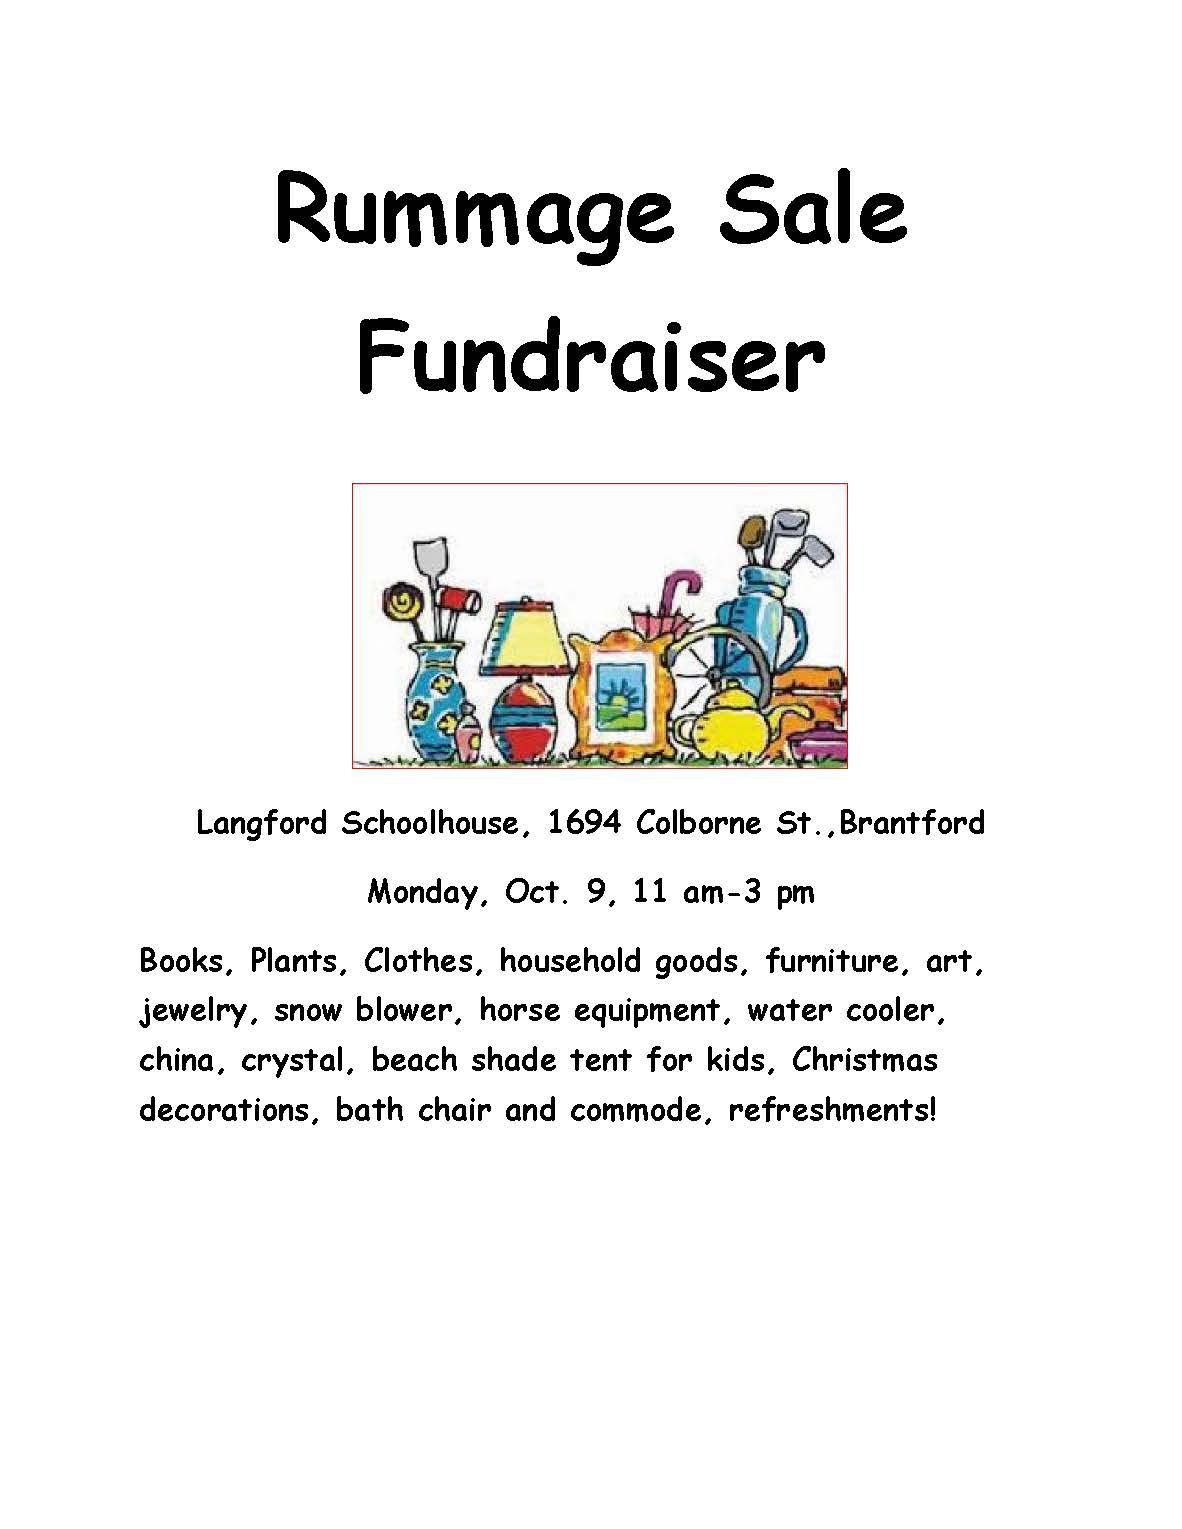 Rummage_Sale_Fundraiser_Oct_9_poster-2.jpg